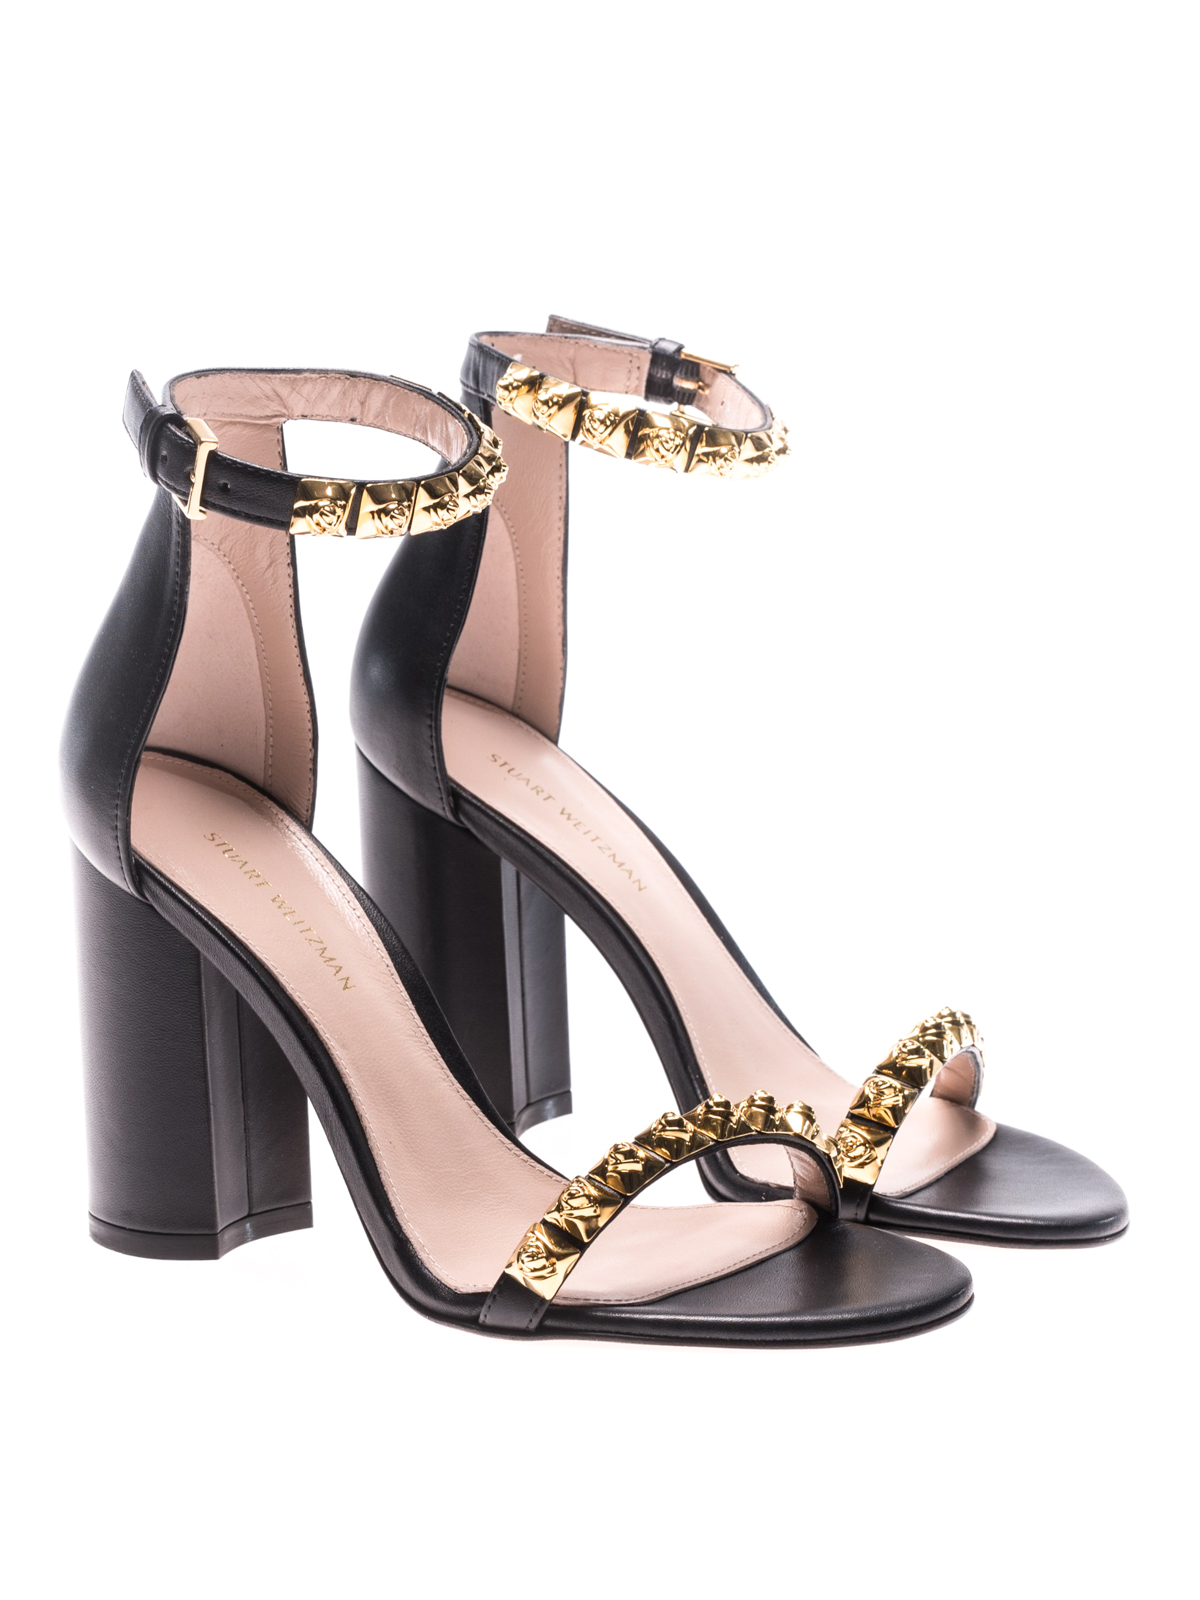 Stuart Weitzman Designer Shoes, Leather Rosemarie Sandals